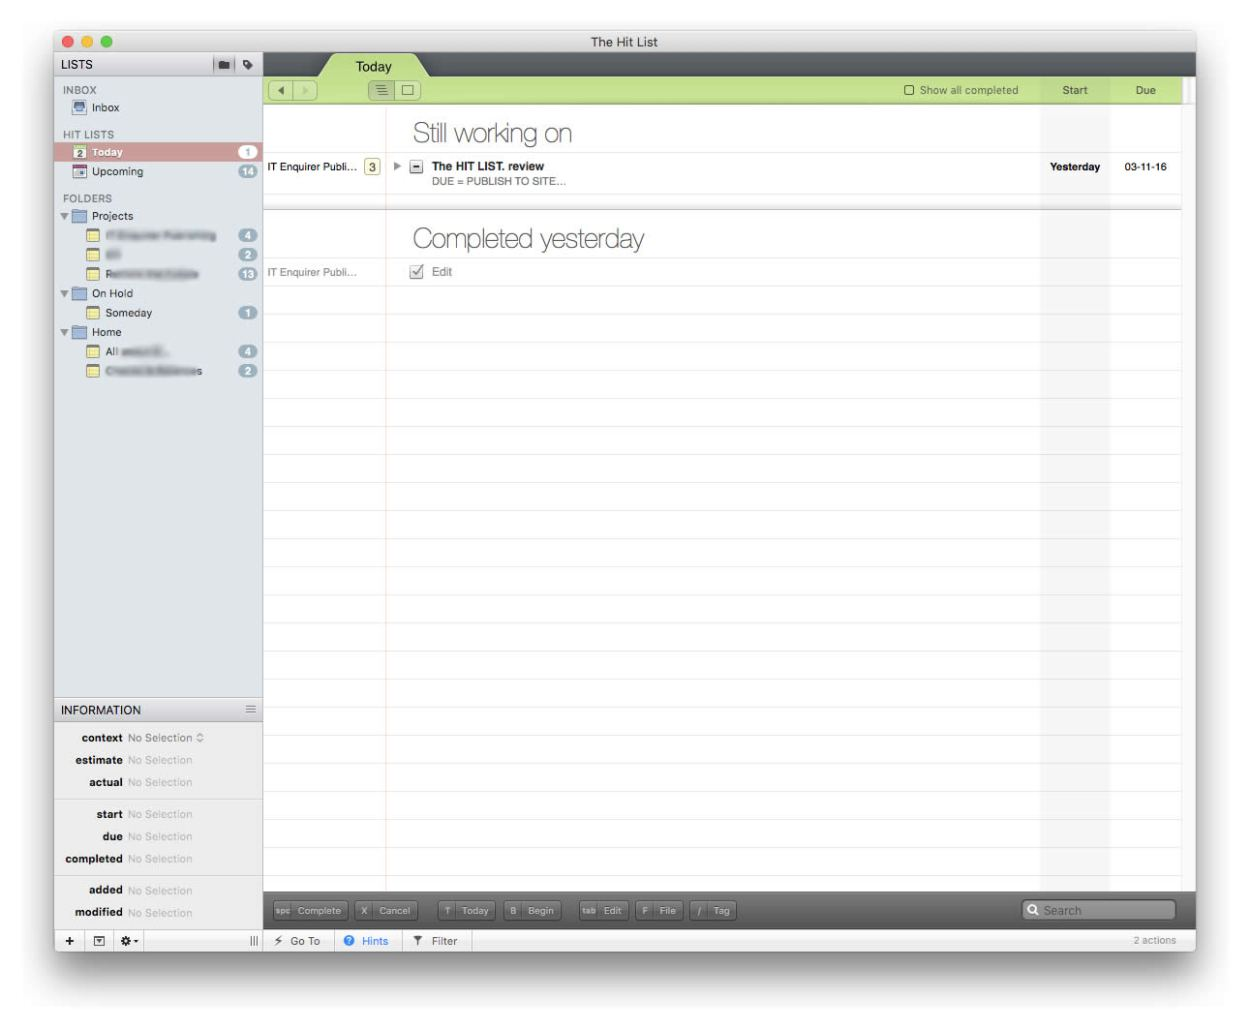 The hit list mac interface